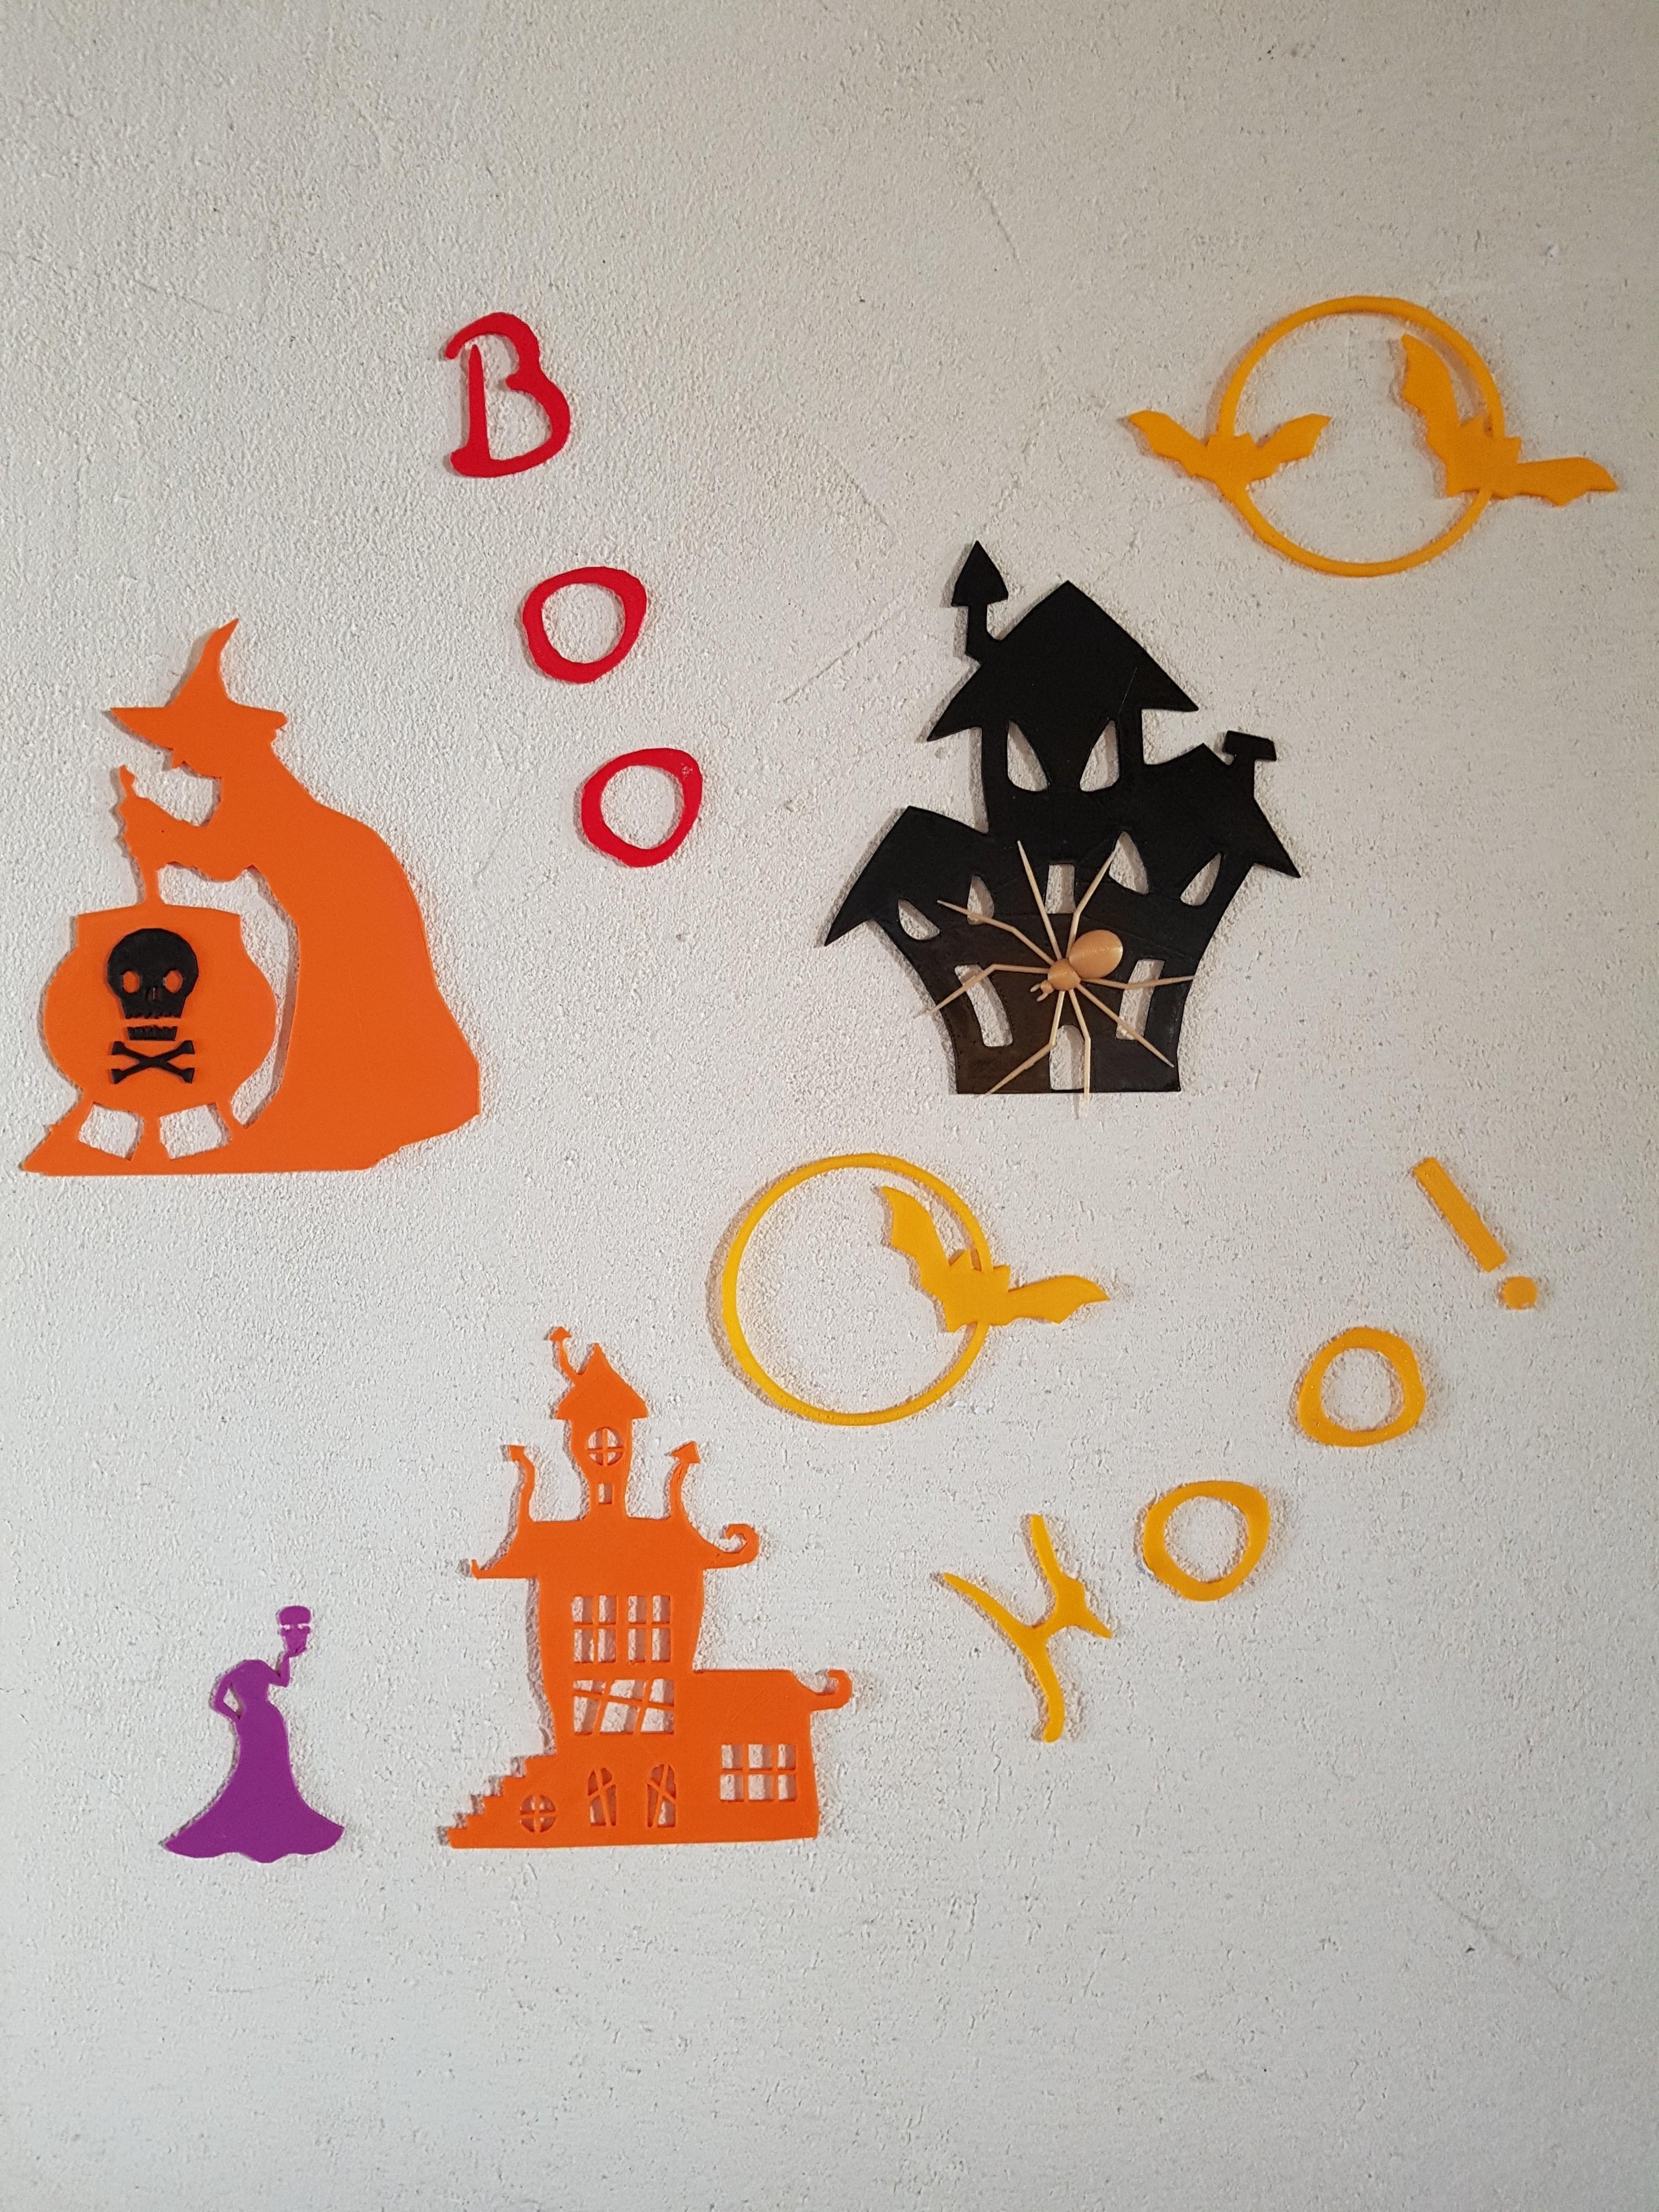 20180930_174750.jpg Download STL file Halloween (full of wall decoration) • 3D print model, catf3d